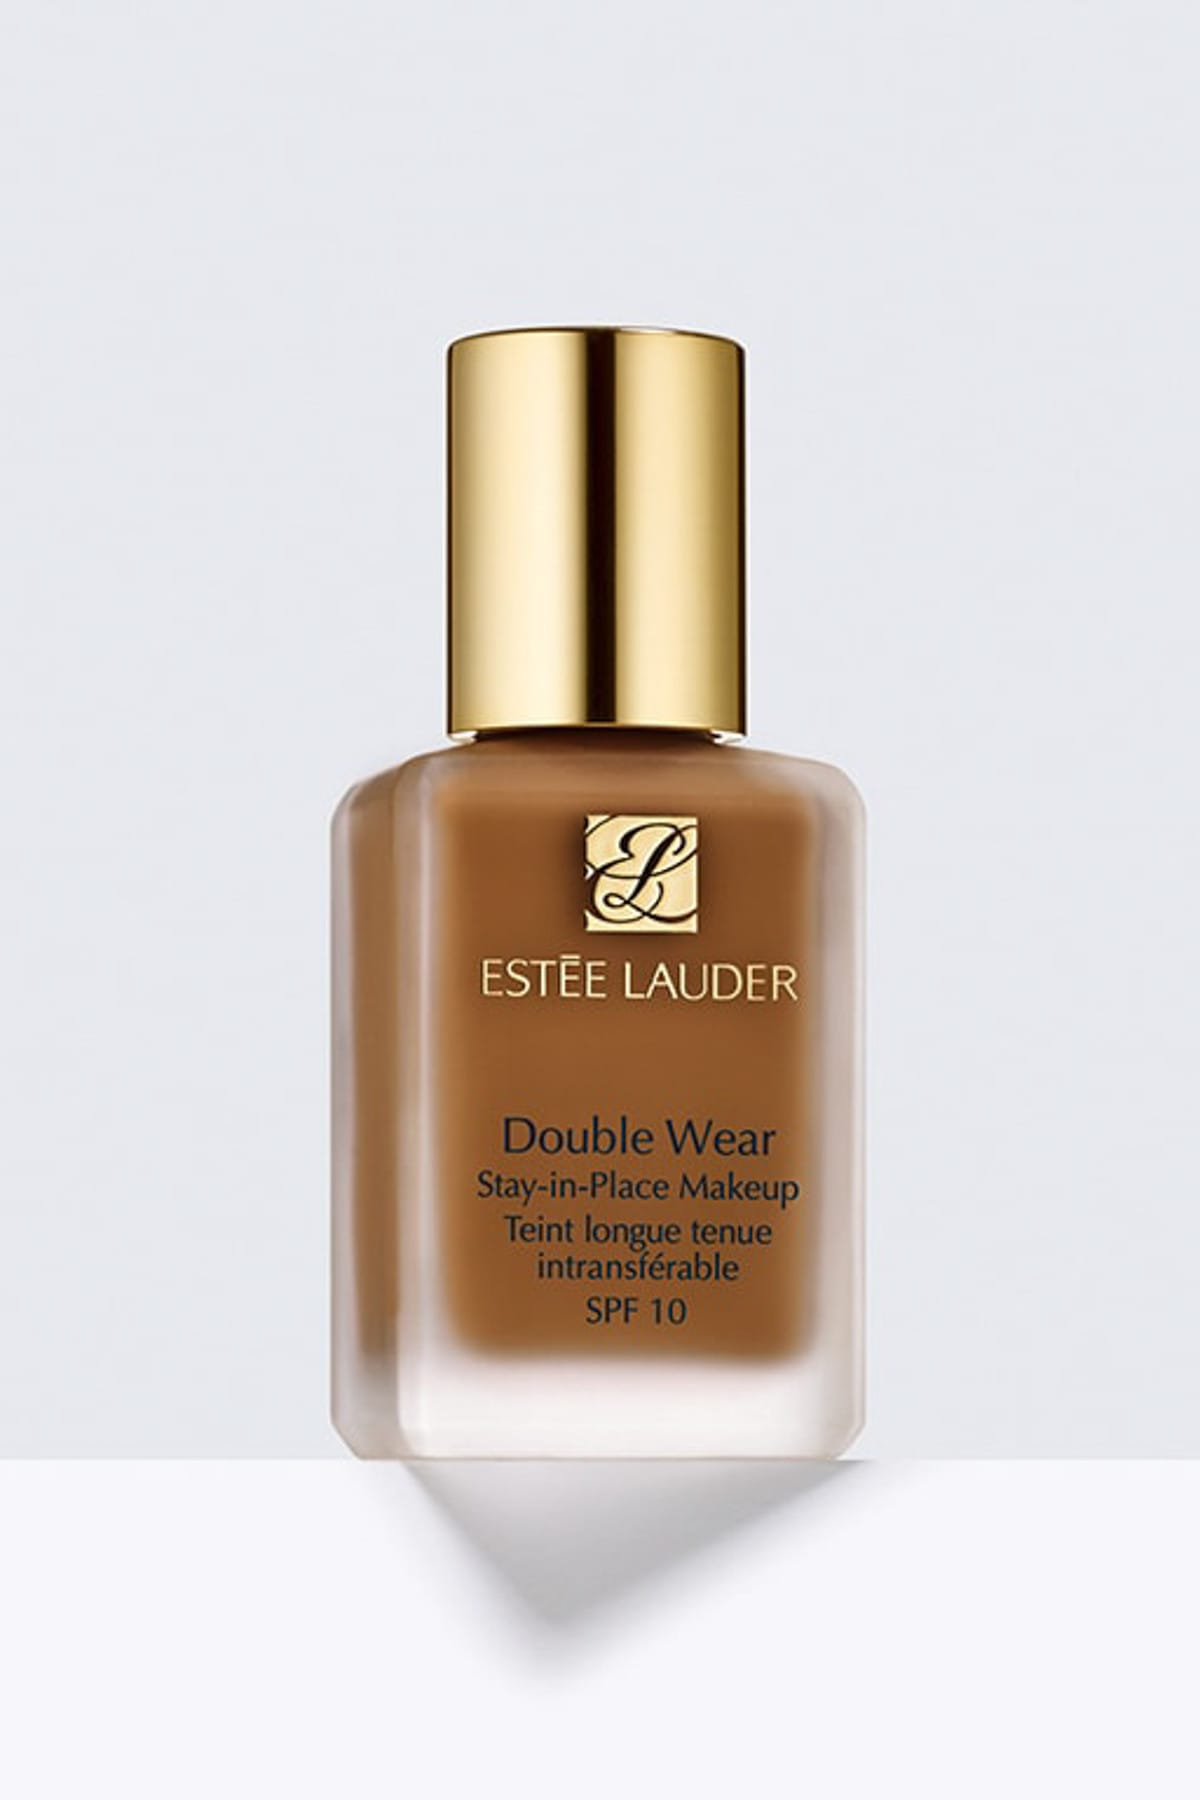 Estee Lauder Fondöten - Double Wear Foundation S.I.P Spf 10 6W2 Nutmeg 30 ml 887167178021 1